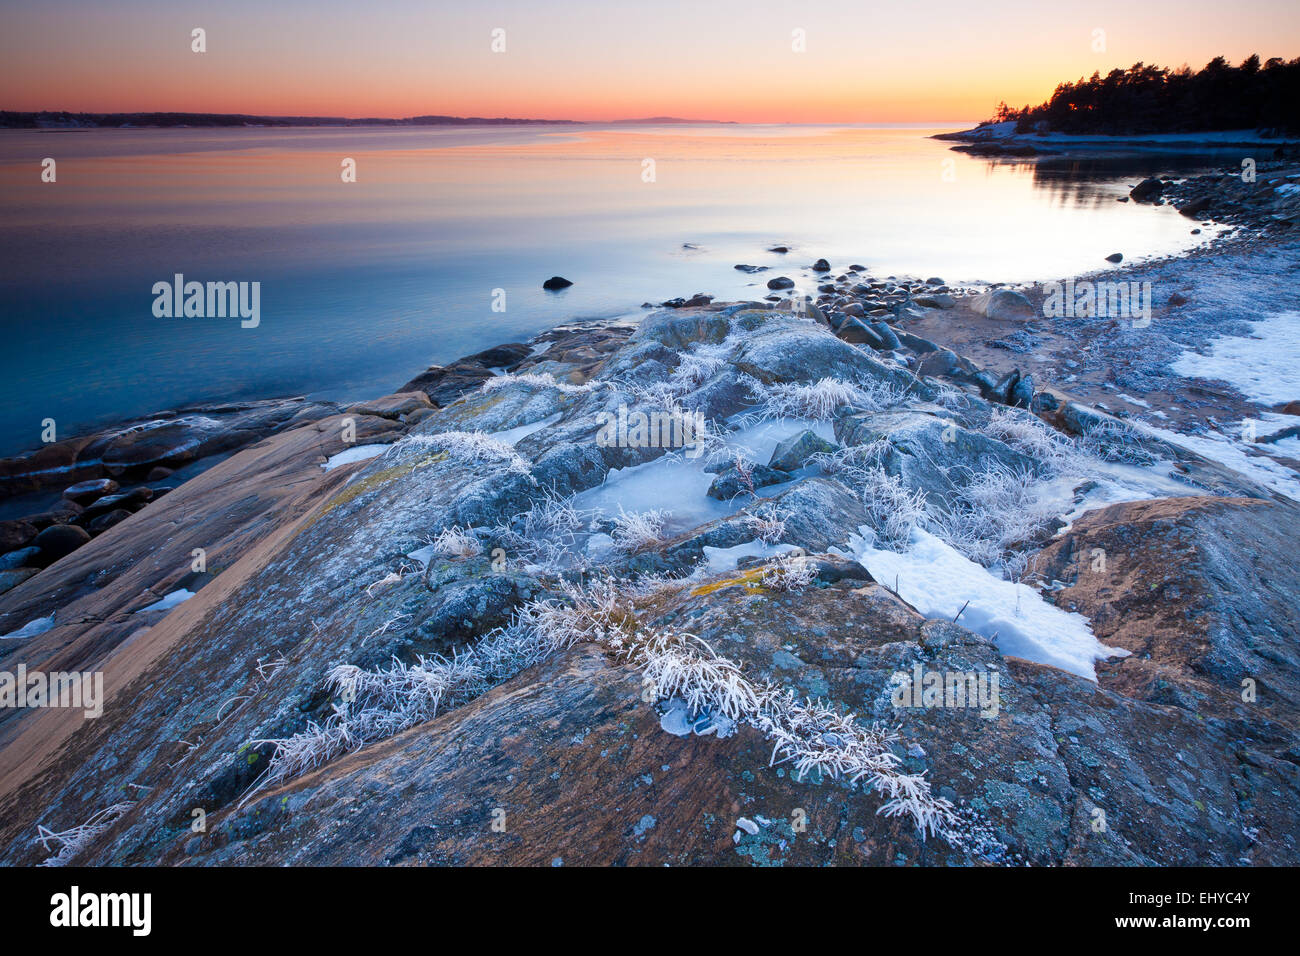 Winter Abend durch den Oslofjord am Ofen in Råde Kommune,, Østfold fylke Rogaland, Norwegen. Stockfoto